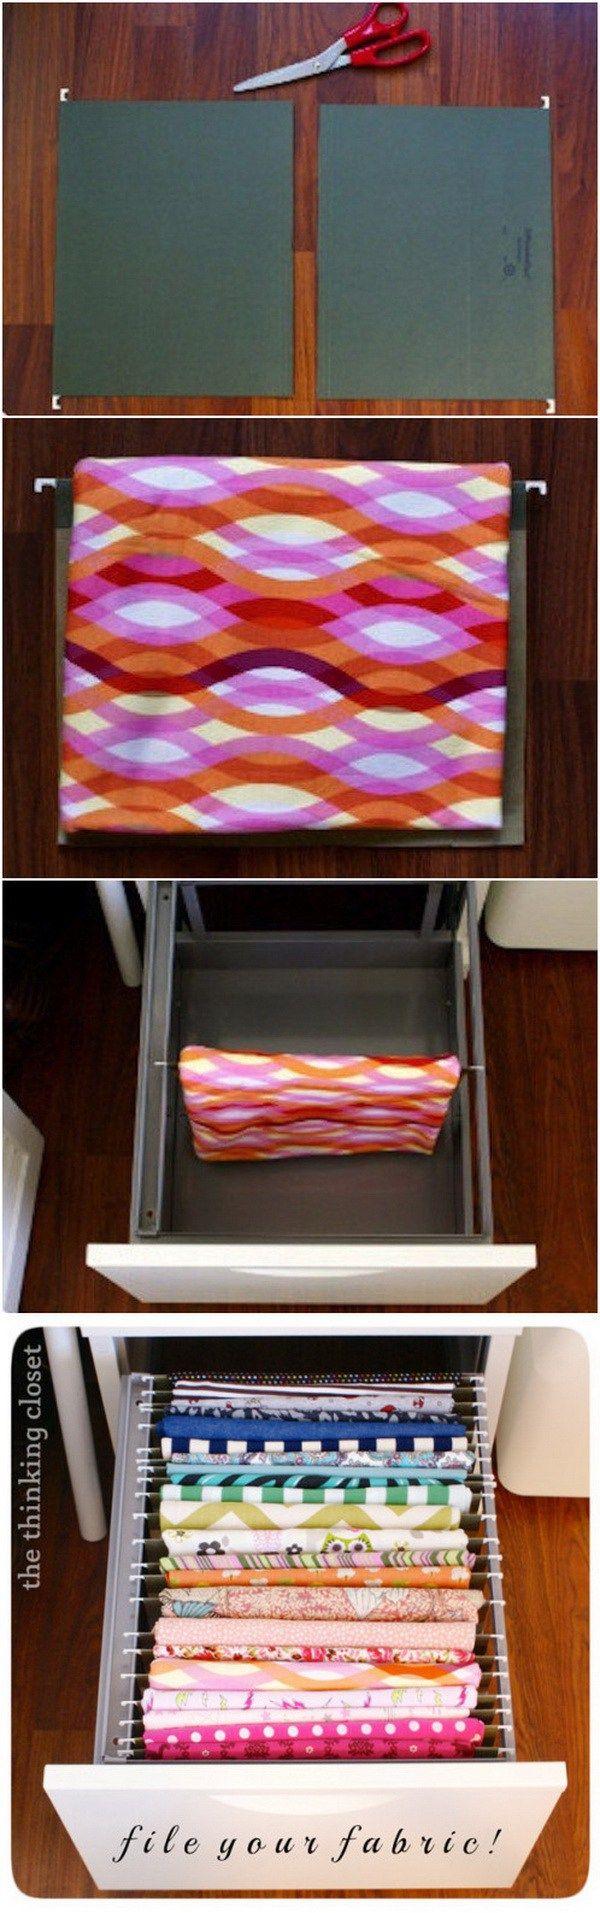 best 20 hanging file folders ideas on pinterest hanging files box file and diy file cabinet. Black Bedroom Furniture Sets. Home Design Ideas